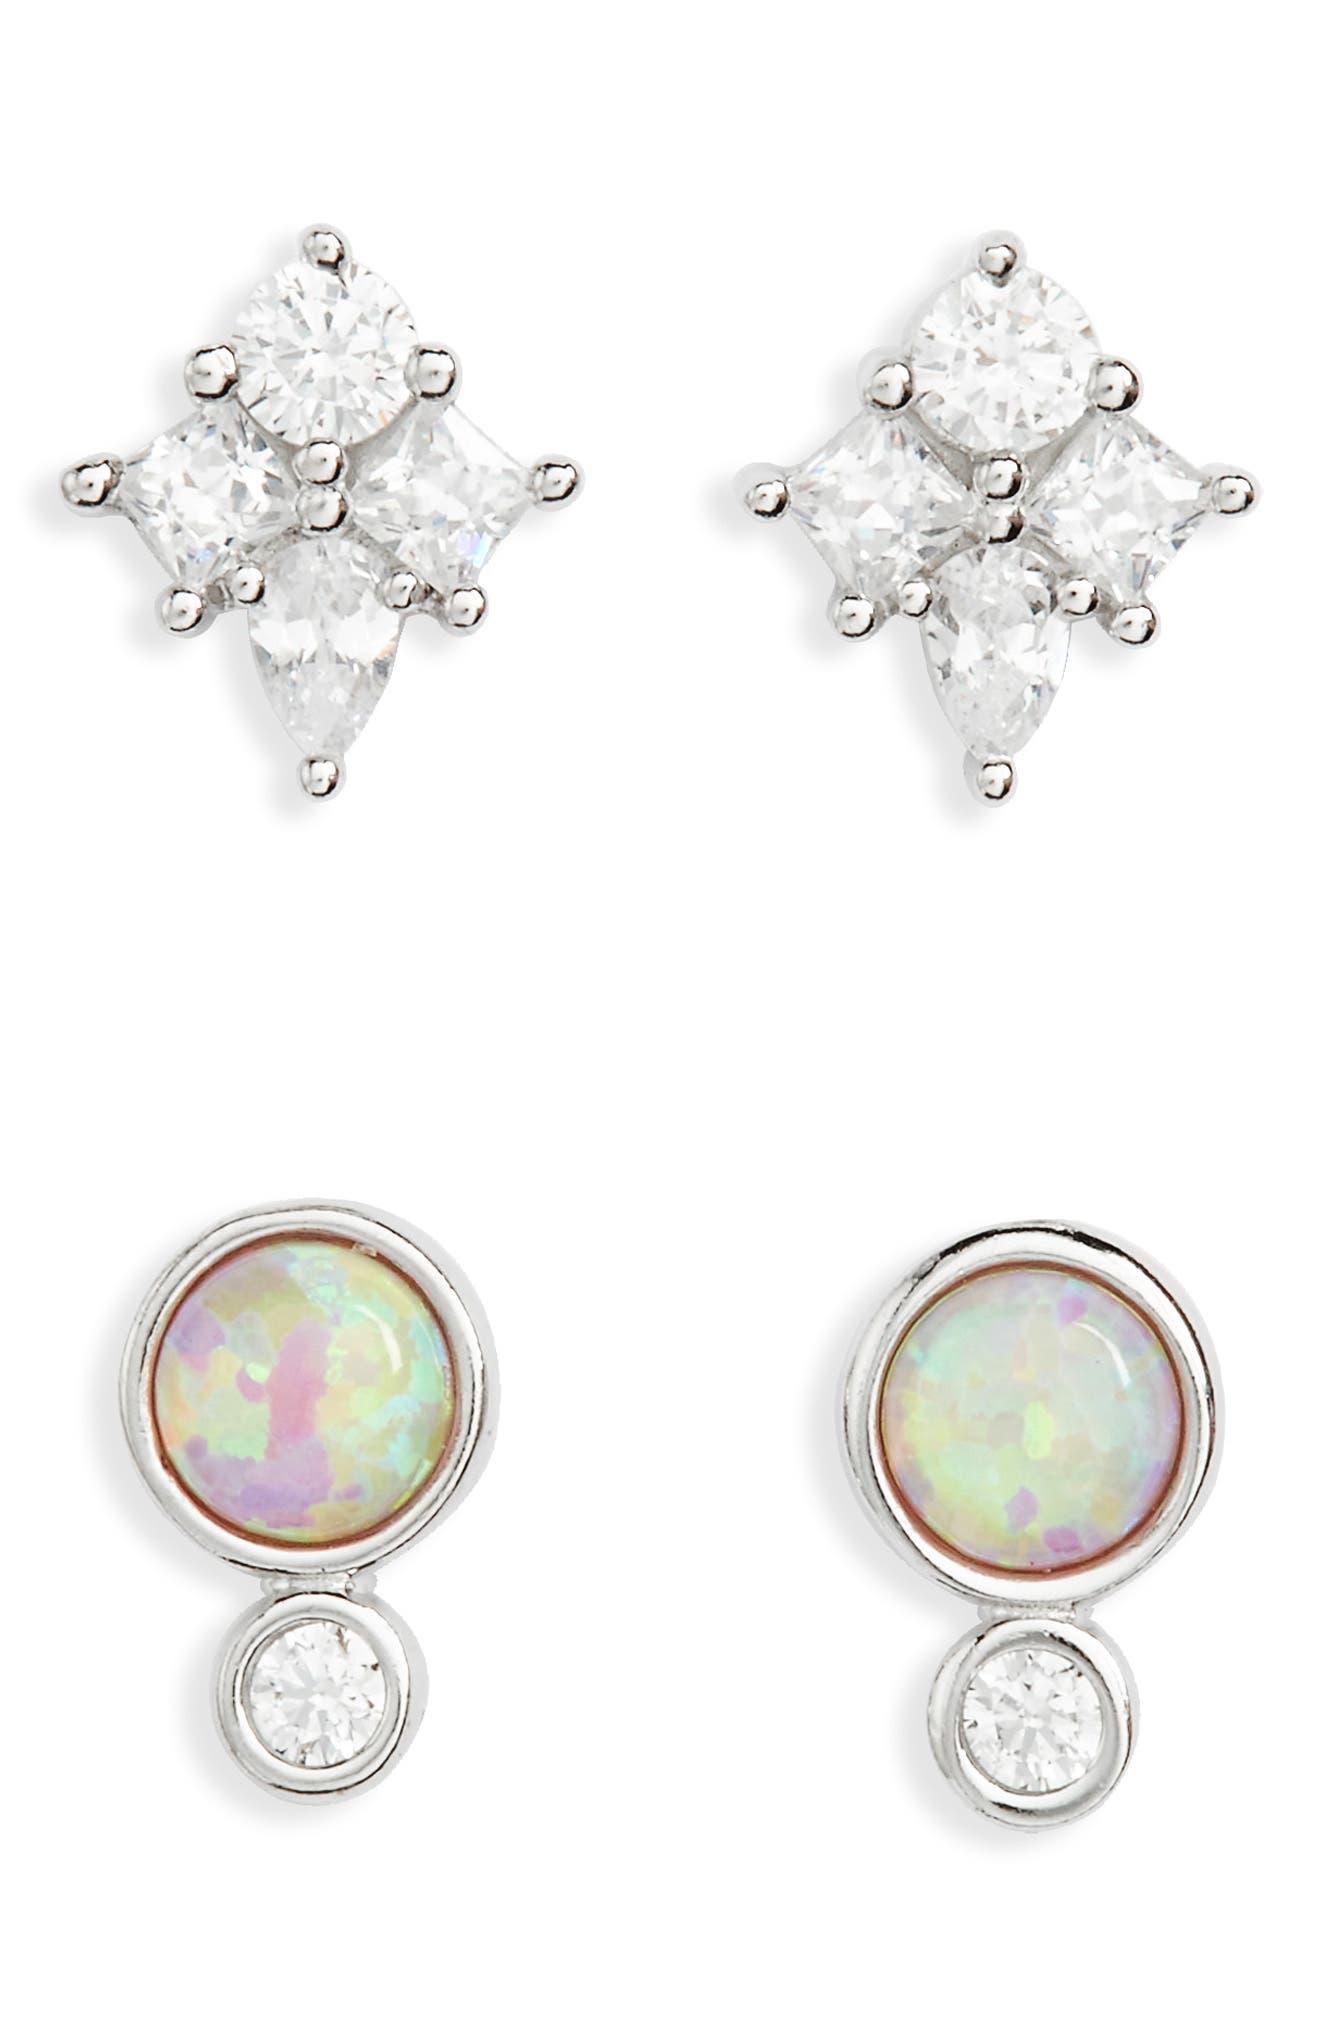 Set of 2 Opal & Cubic Zirconia Stud Earrings,                             Main thumbnail 1, color,                             Platinum